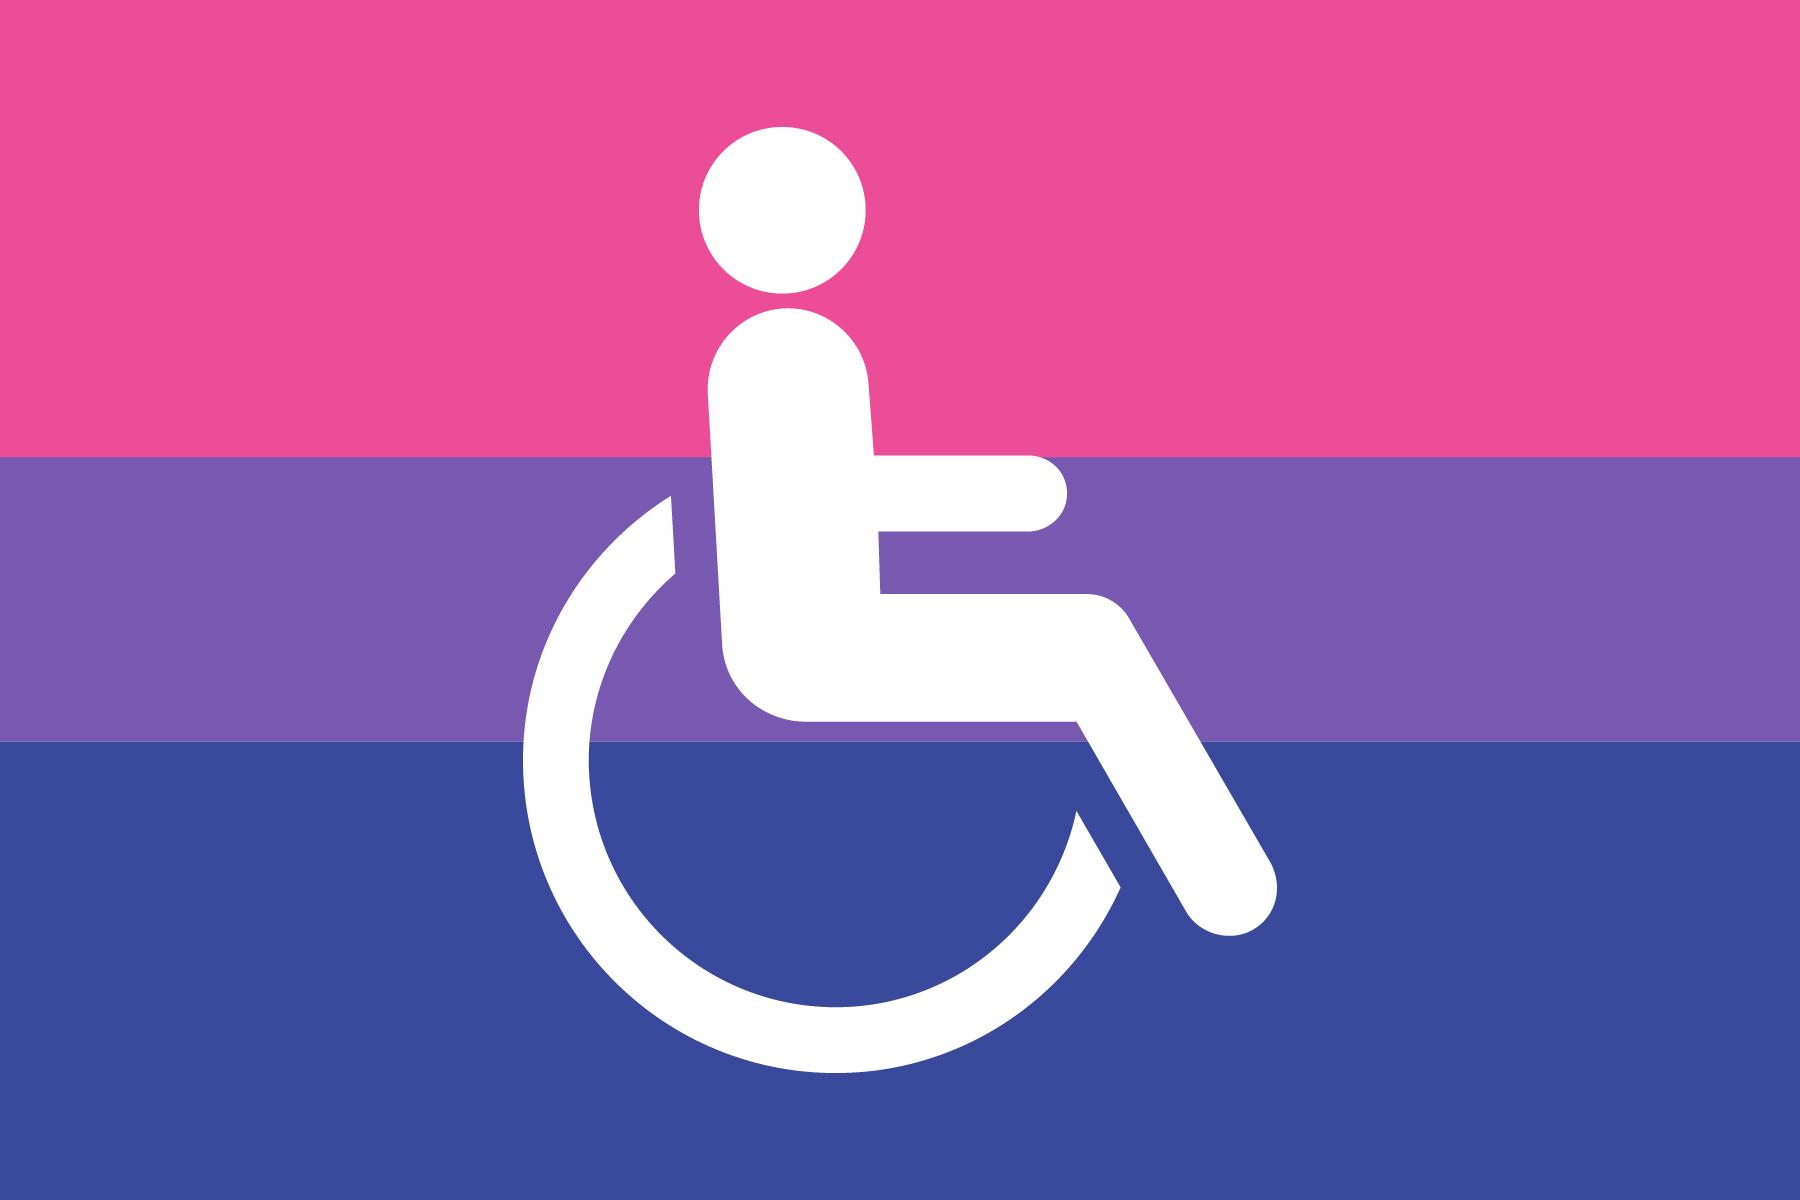 Bi flag behind white wheelchair symbol